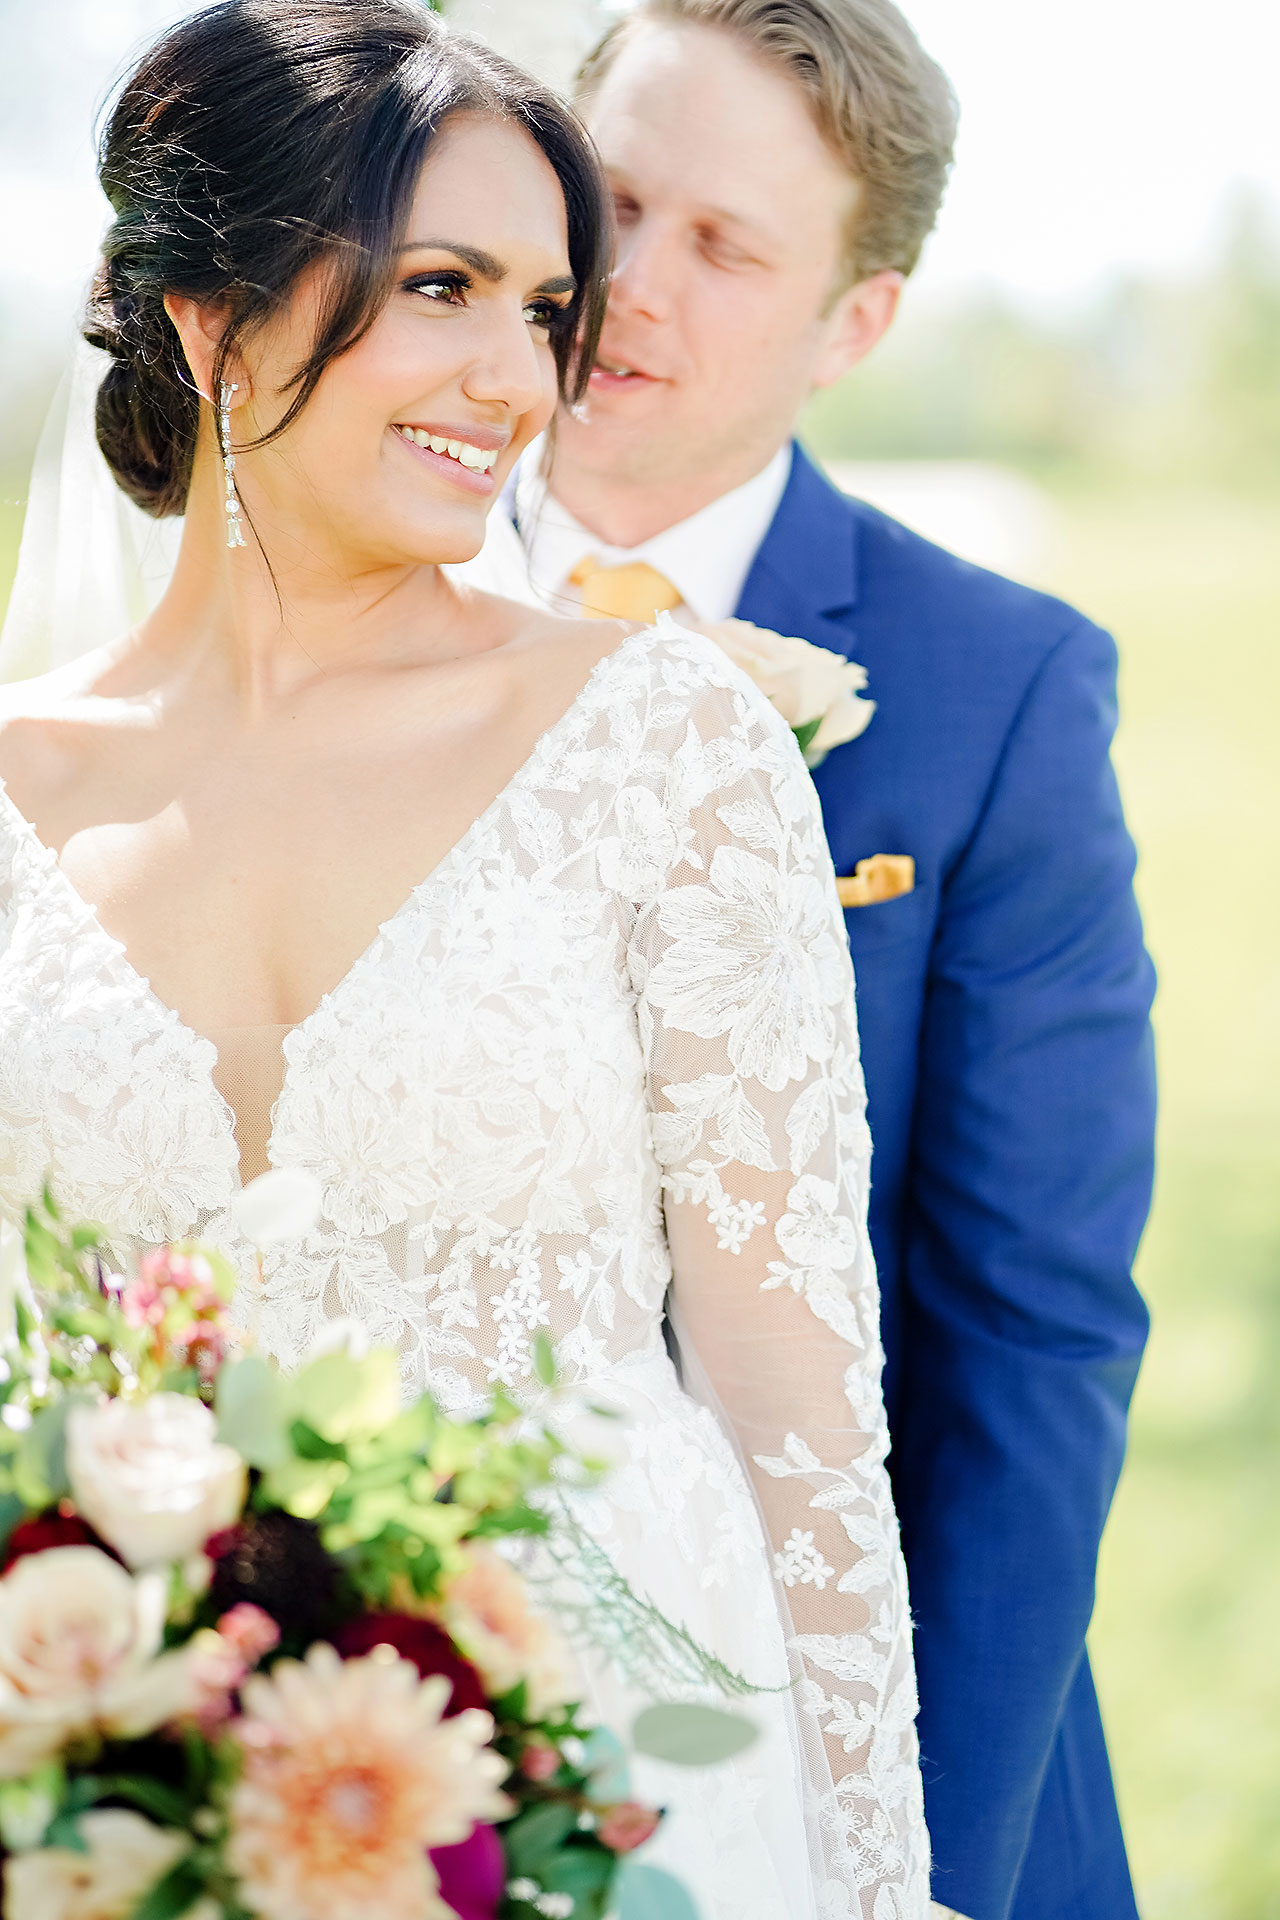 Nadia Parker Black Iris Estate Carmel Indiana Wedding May 2021 067